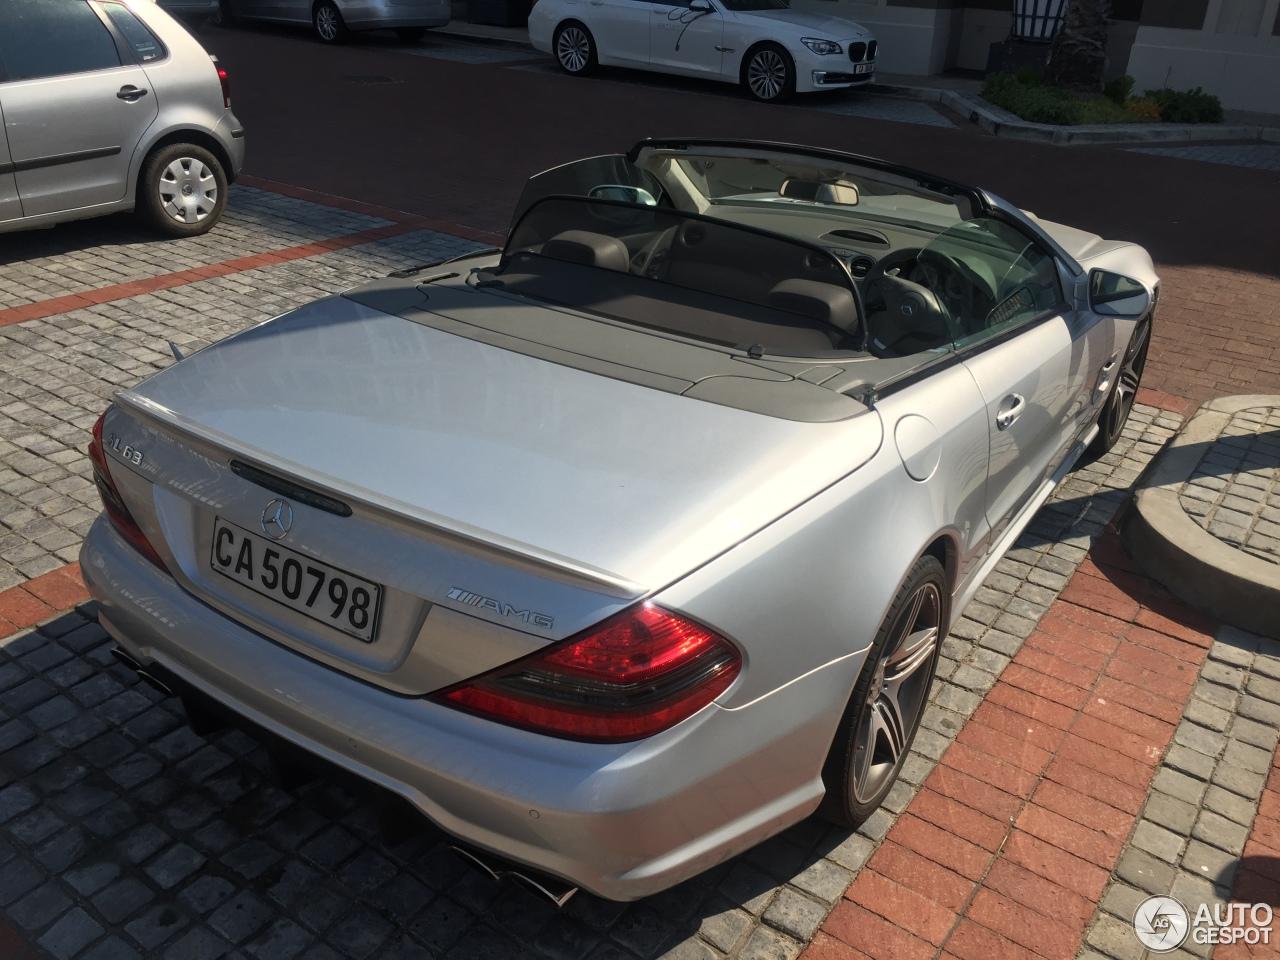 Mercedes benz sl 63 amg 20 january 2016 autogespot for Mercedes benz sl550 amg price